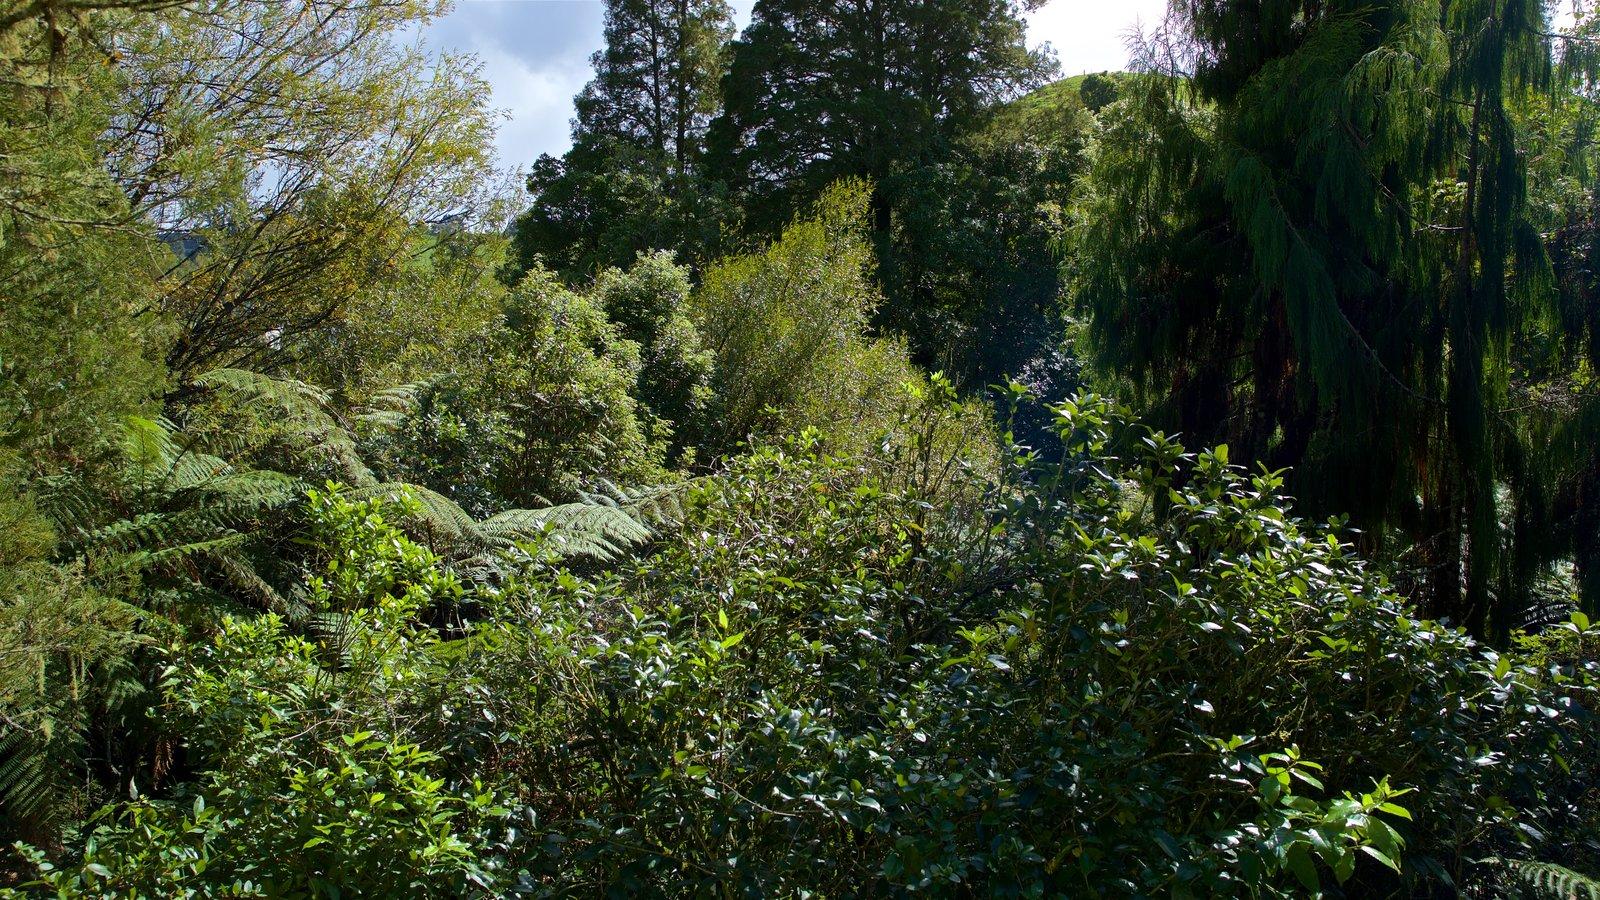 Waitomo Glowworm Caves mostrando florestas